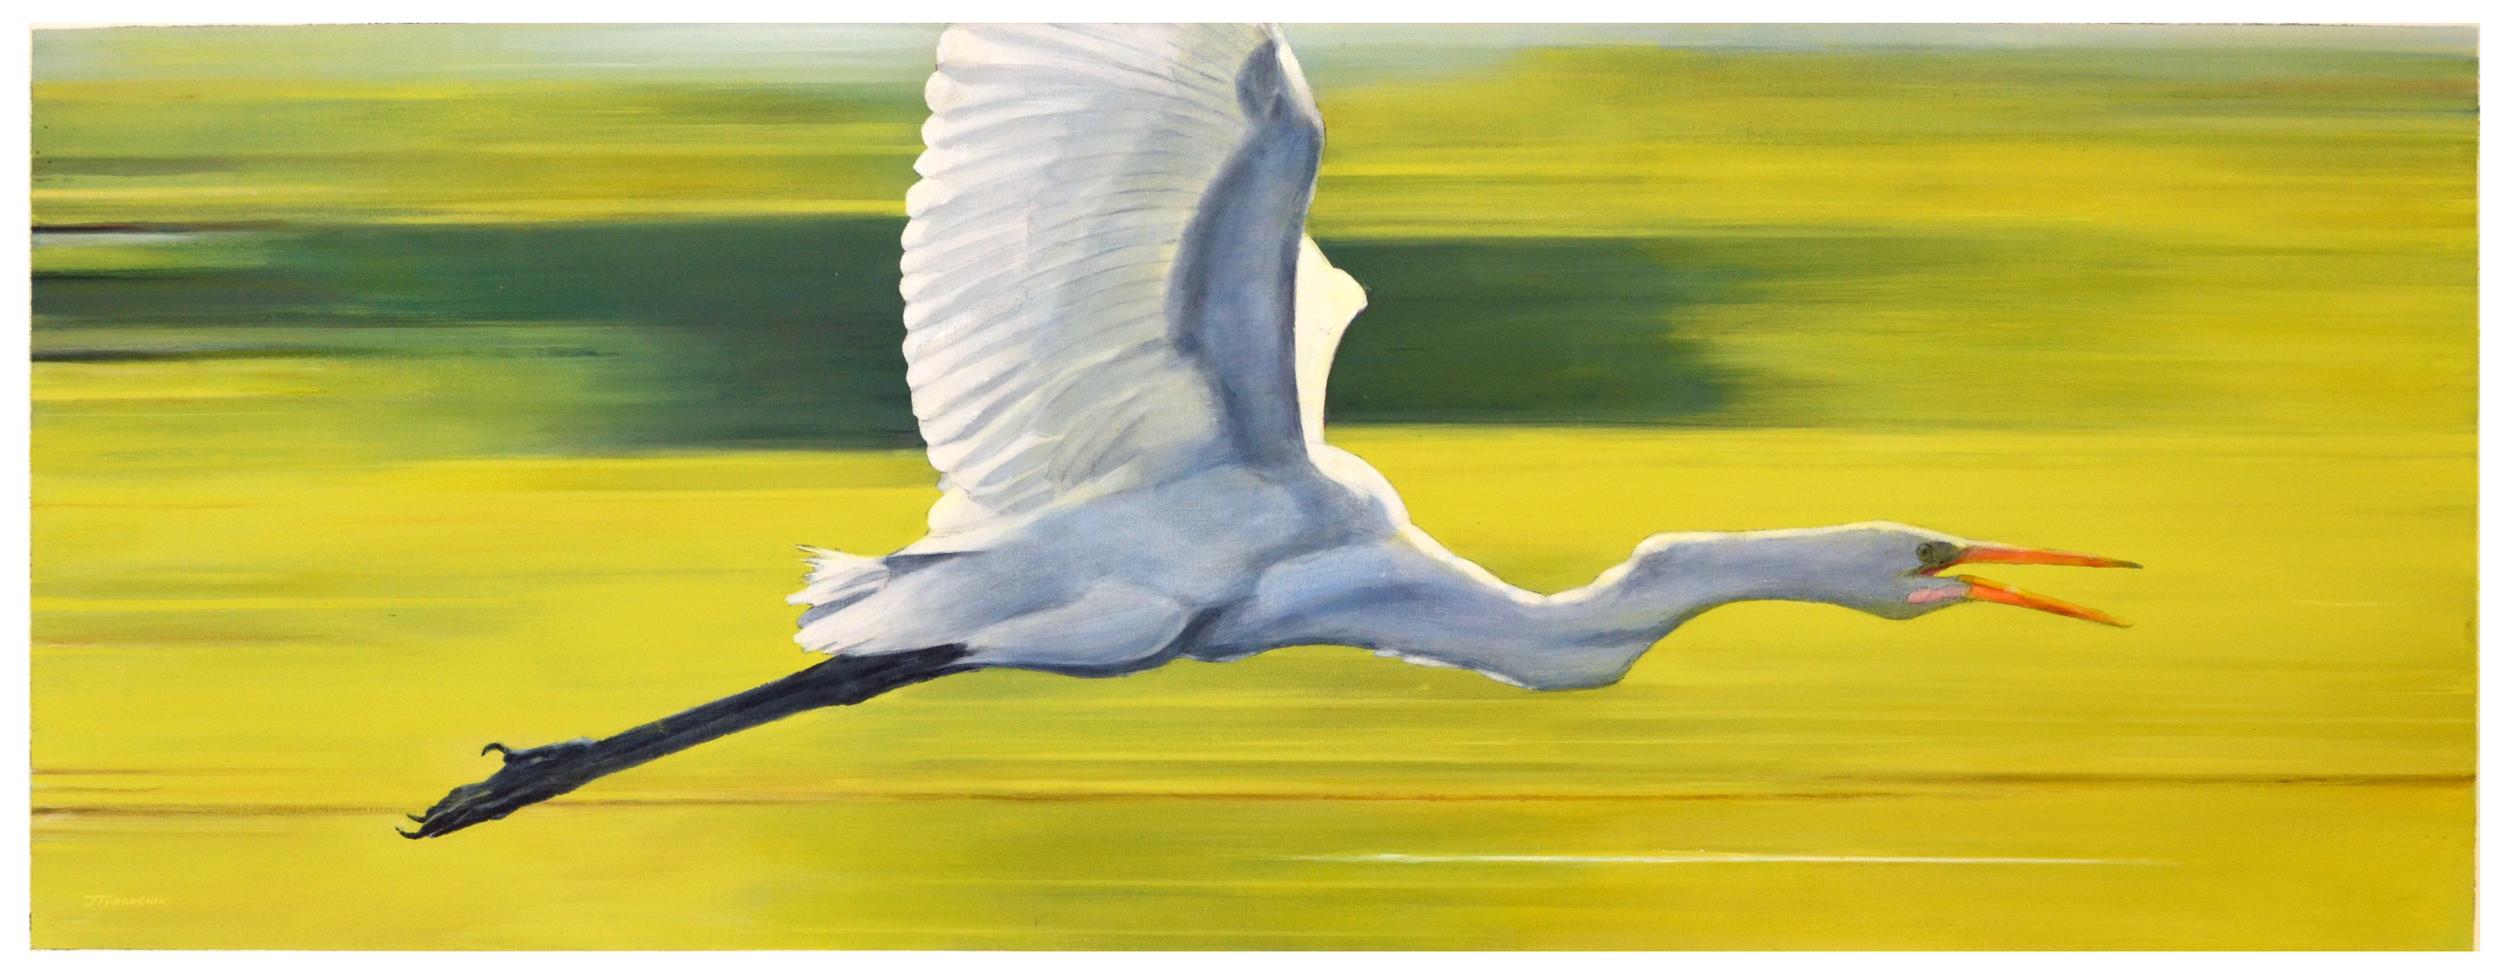 Bird in Flight - Great Egret